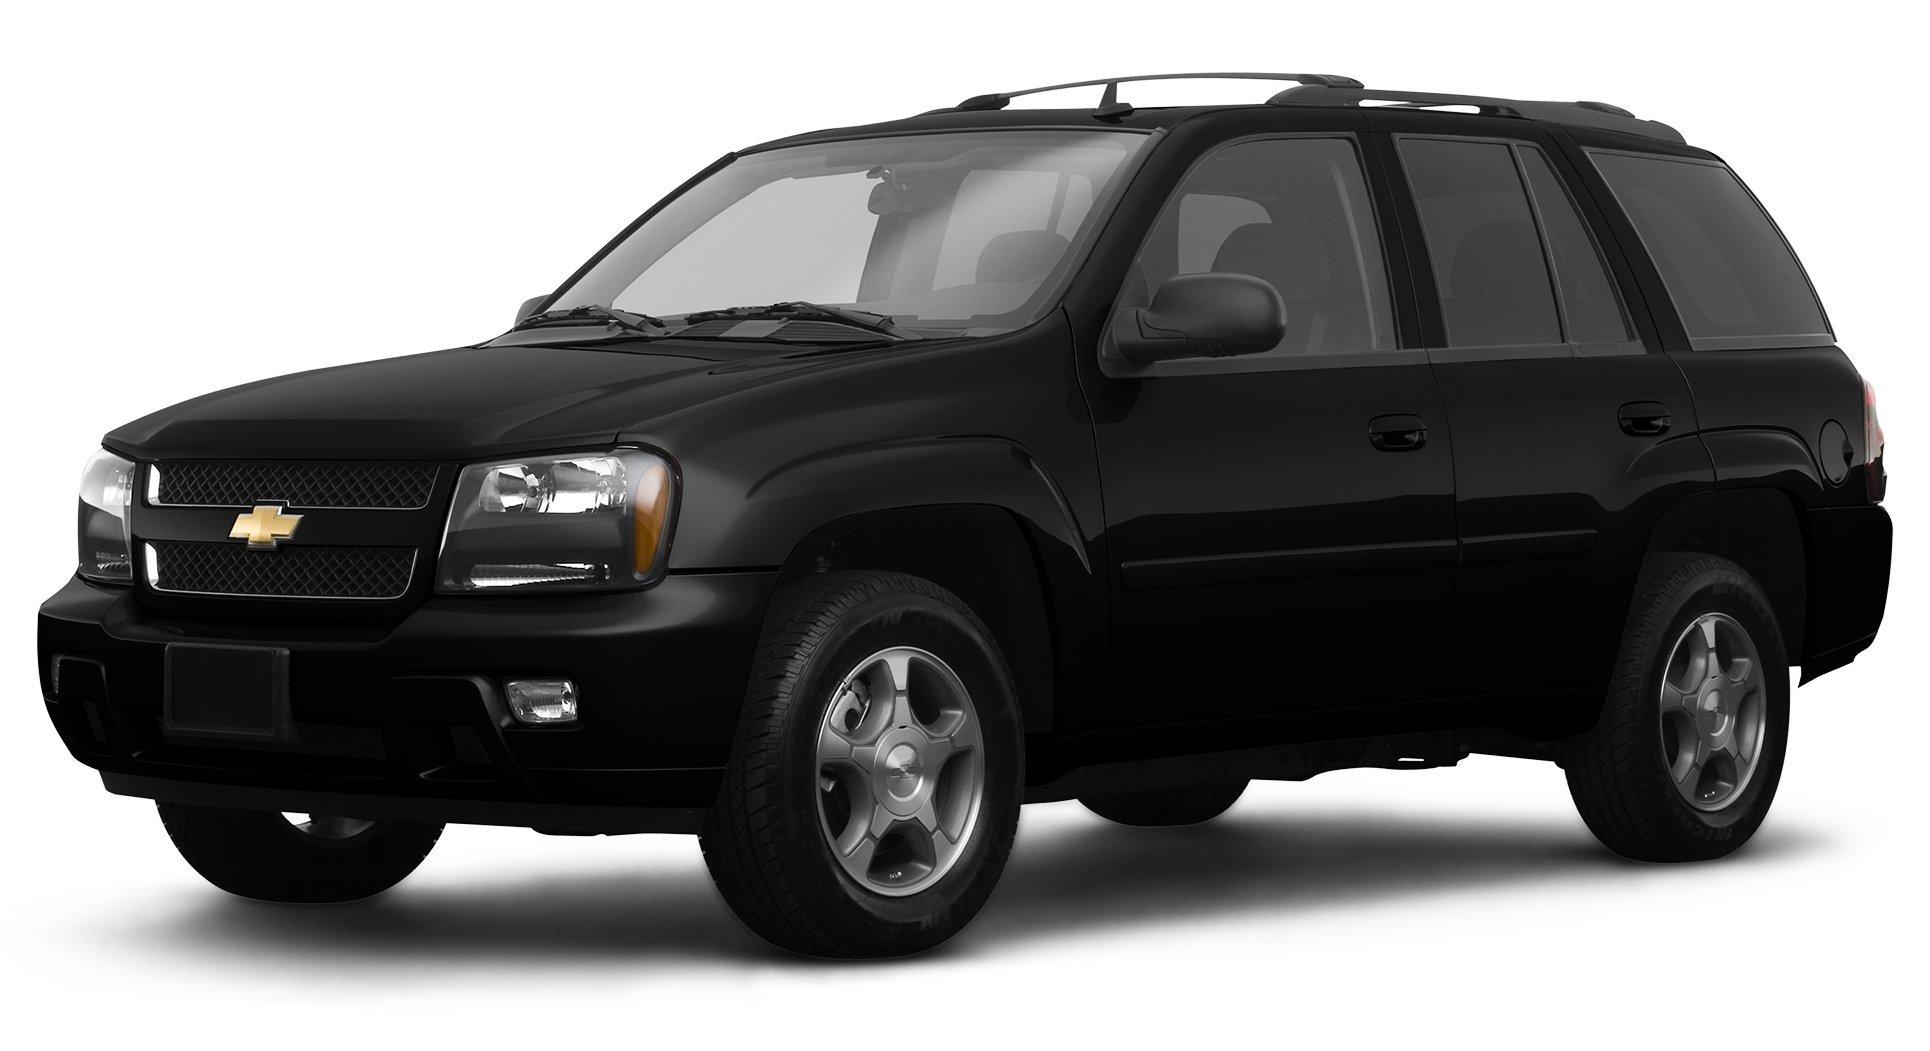 amazon com 2008 chevrolet trailblazer reviews, images, and specs 2008 Trailblazer LT 4WD 2008 chevrolet trailblazer lt w 1lt option package, 2 wheel drive 4